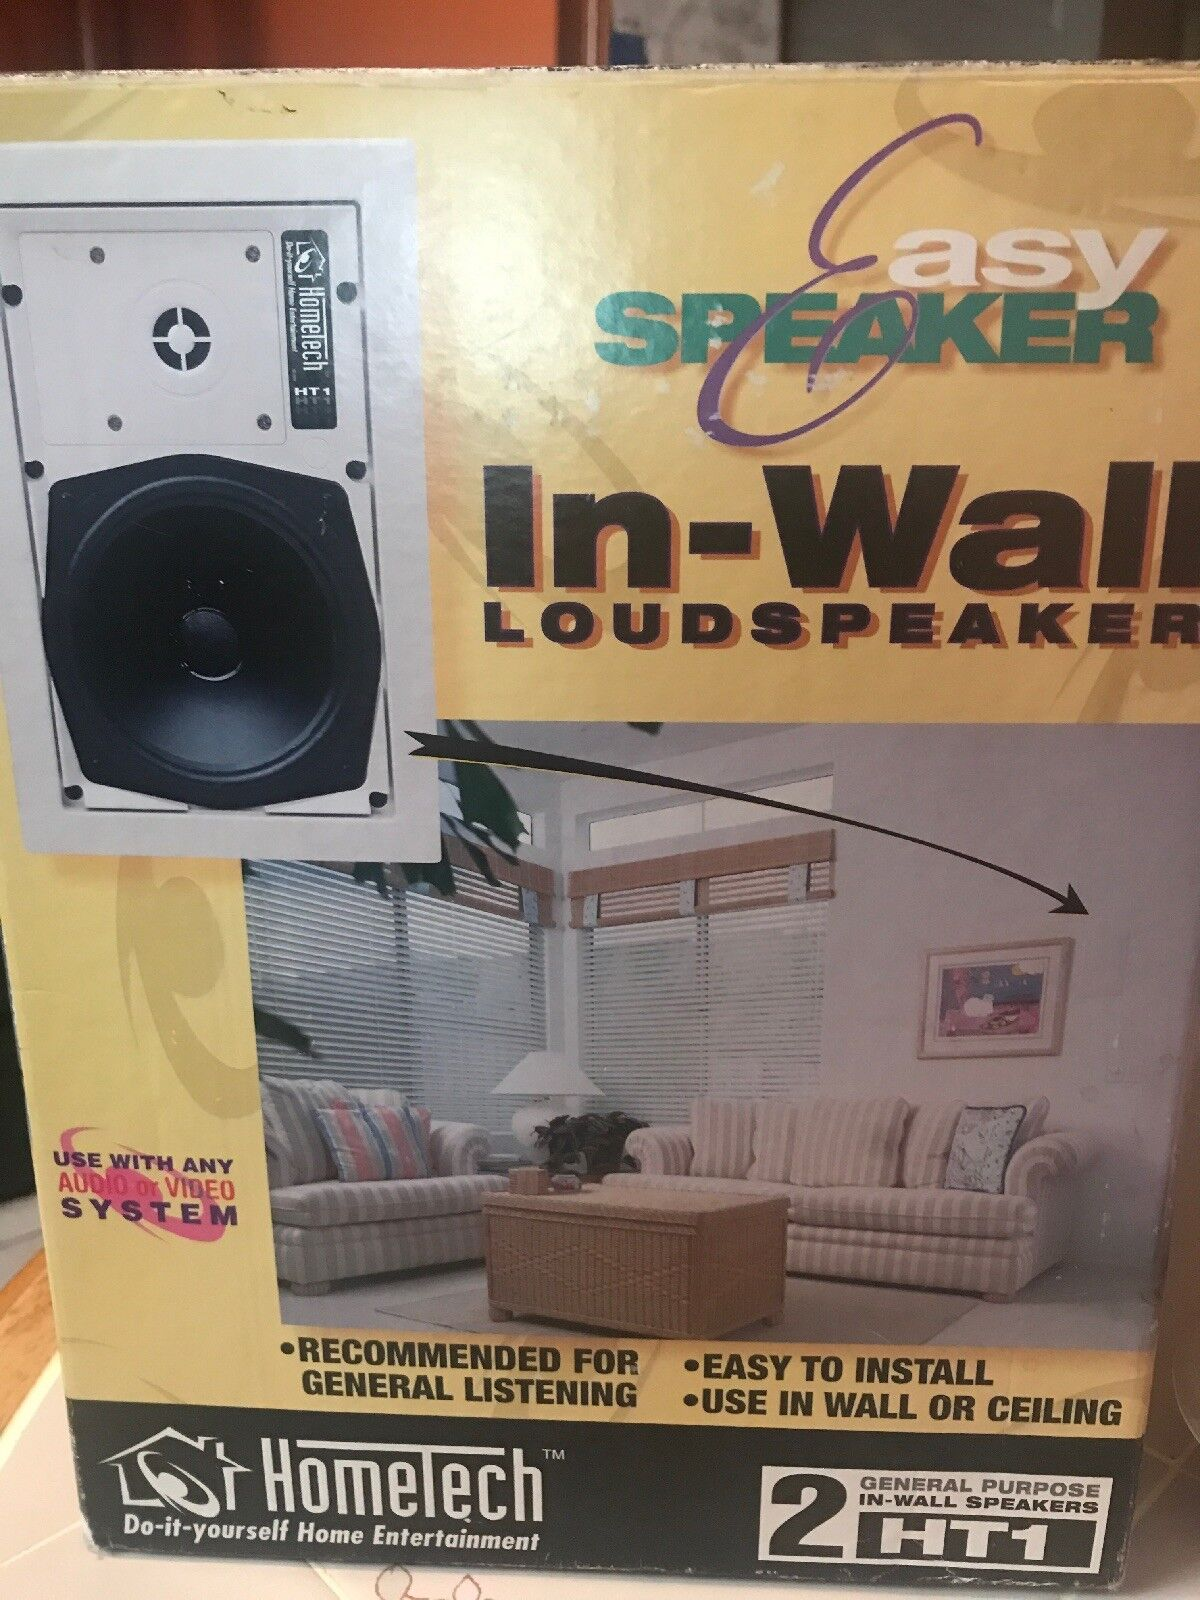 Hometech By Sonance Easy In-Wall Speakers